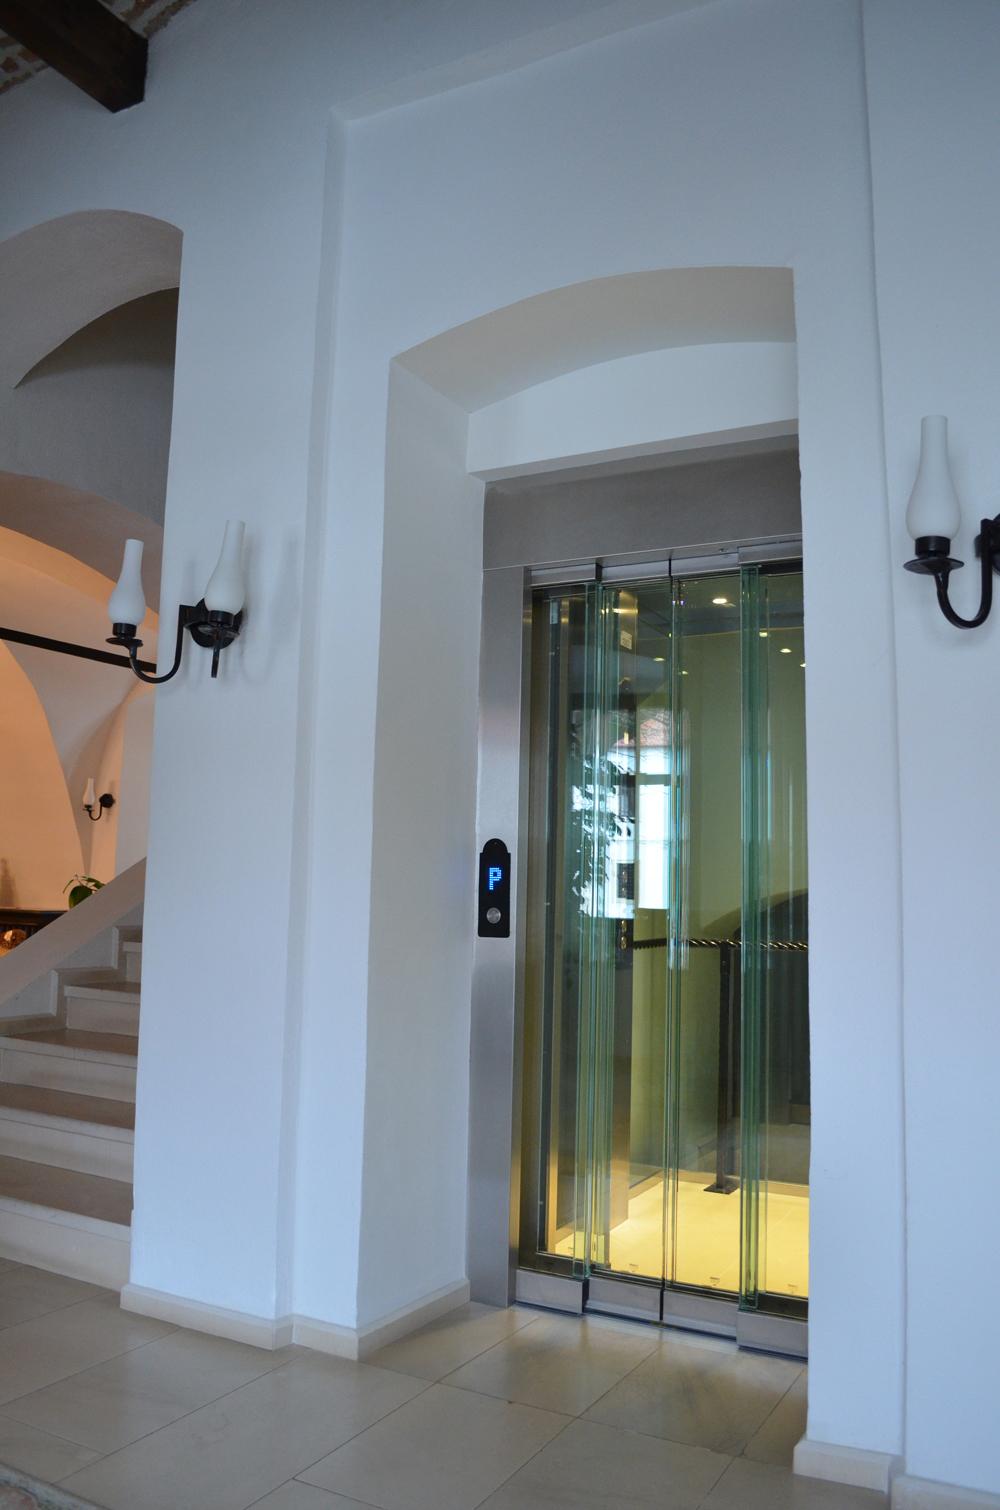 Ascensor panoramic - Hotel ALBA IULIA ELMAS - Poza 1